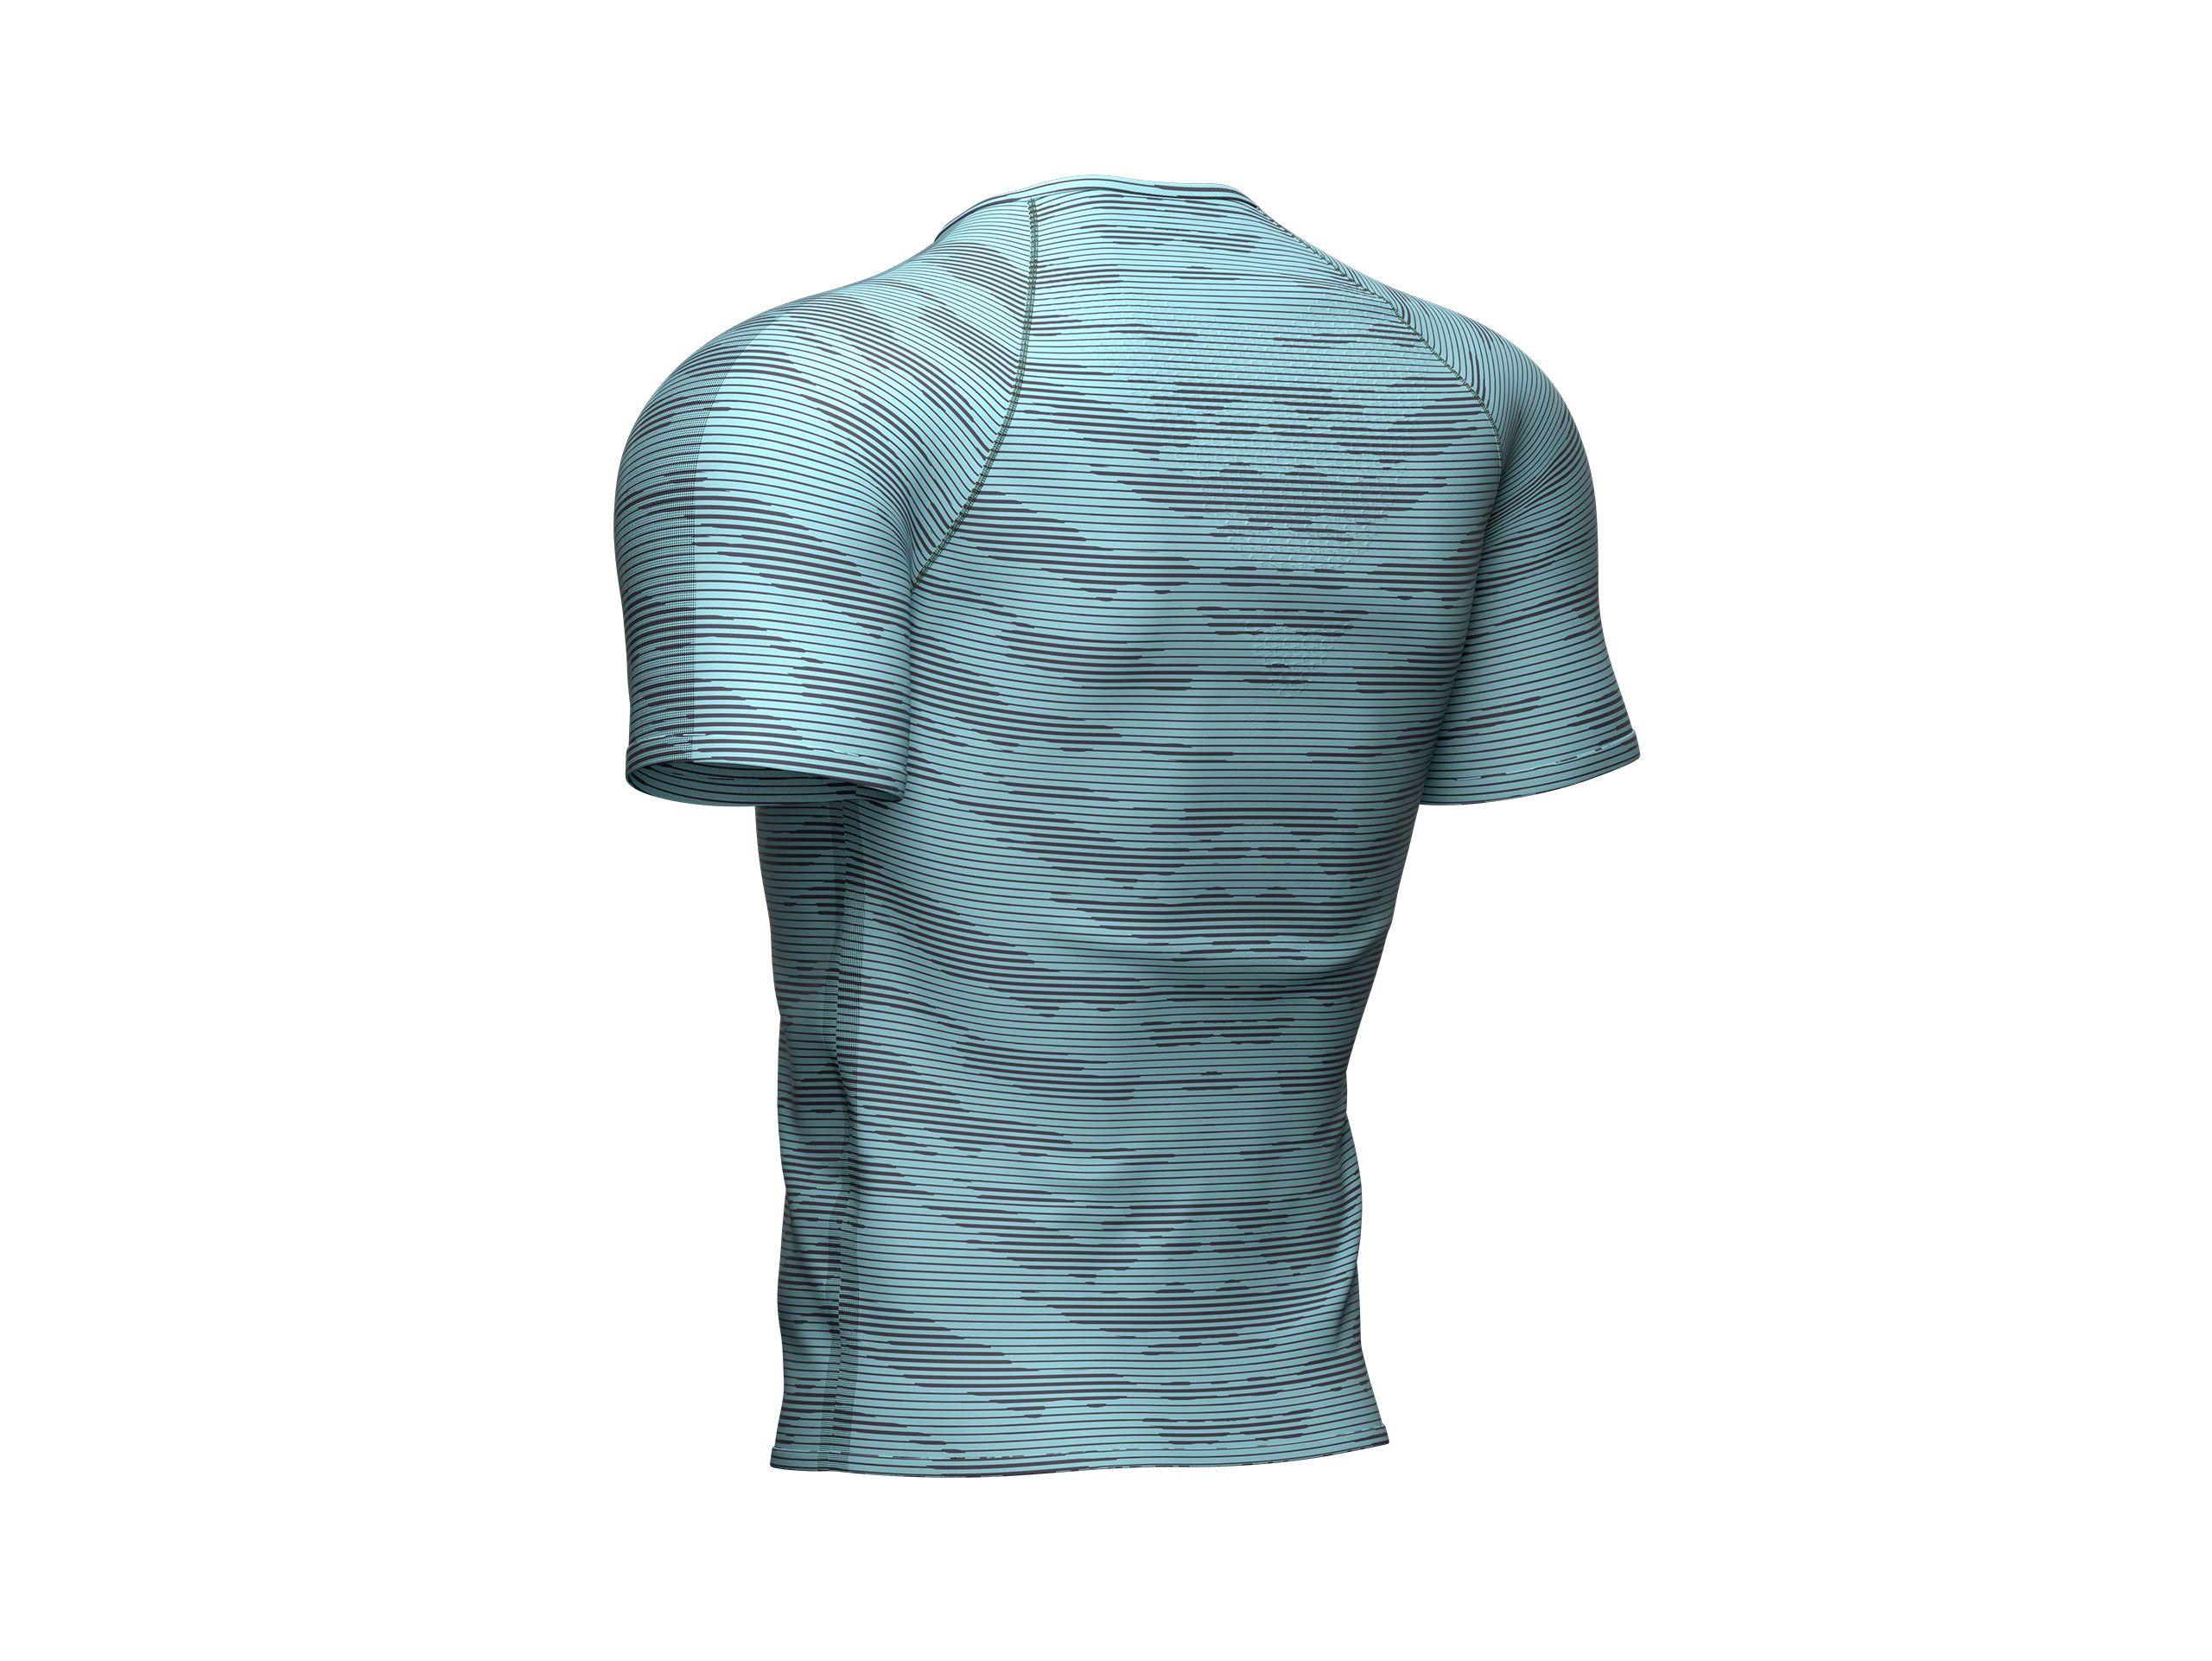 Camiseta Camo Training Ss - Nile Blue